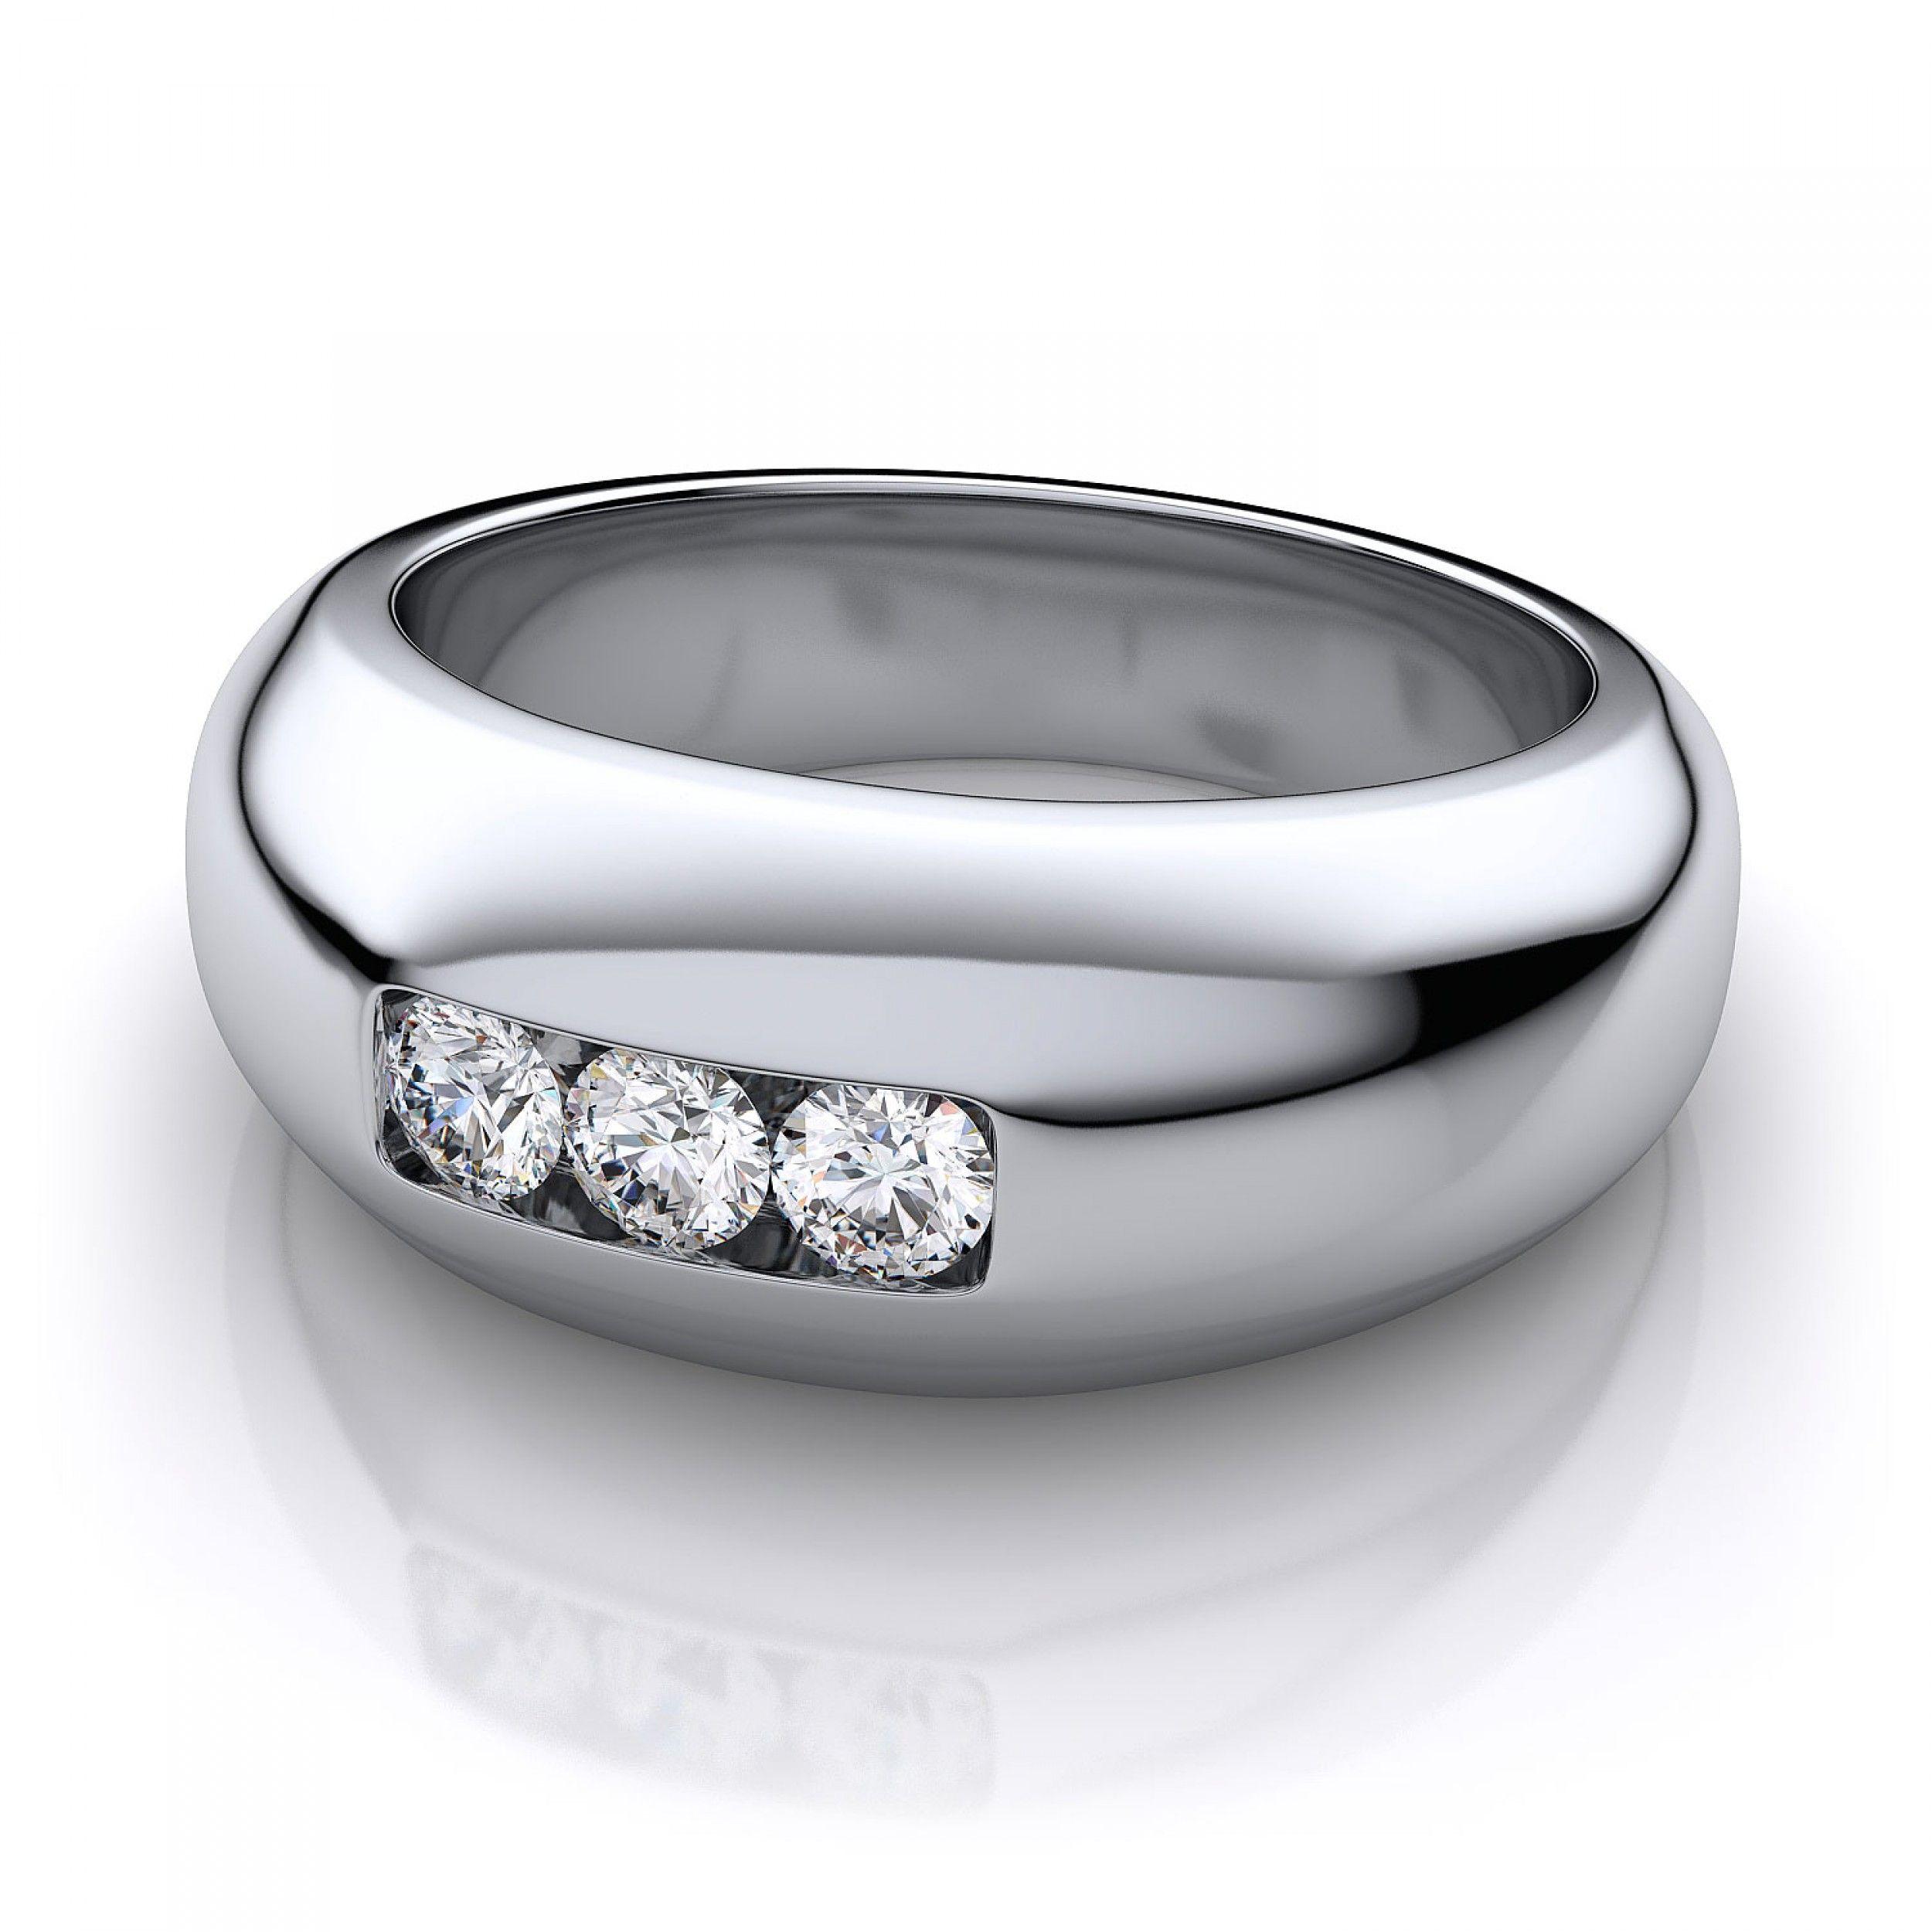 diamond wedding ring,wedding rings for men,kay jewelers wedding